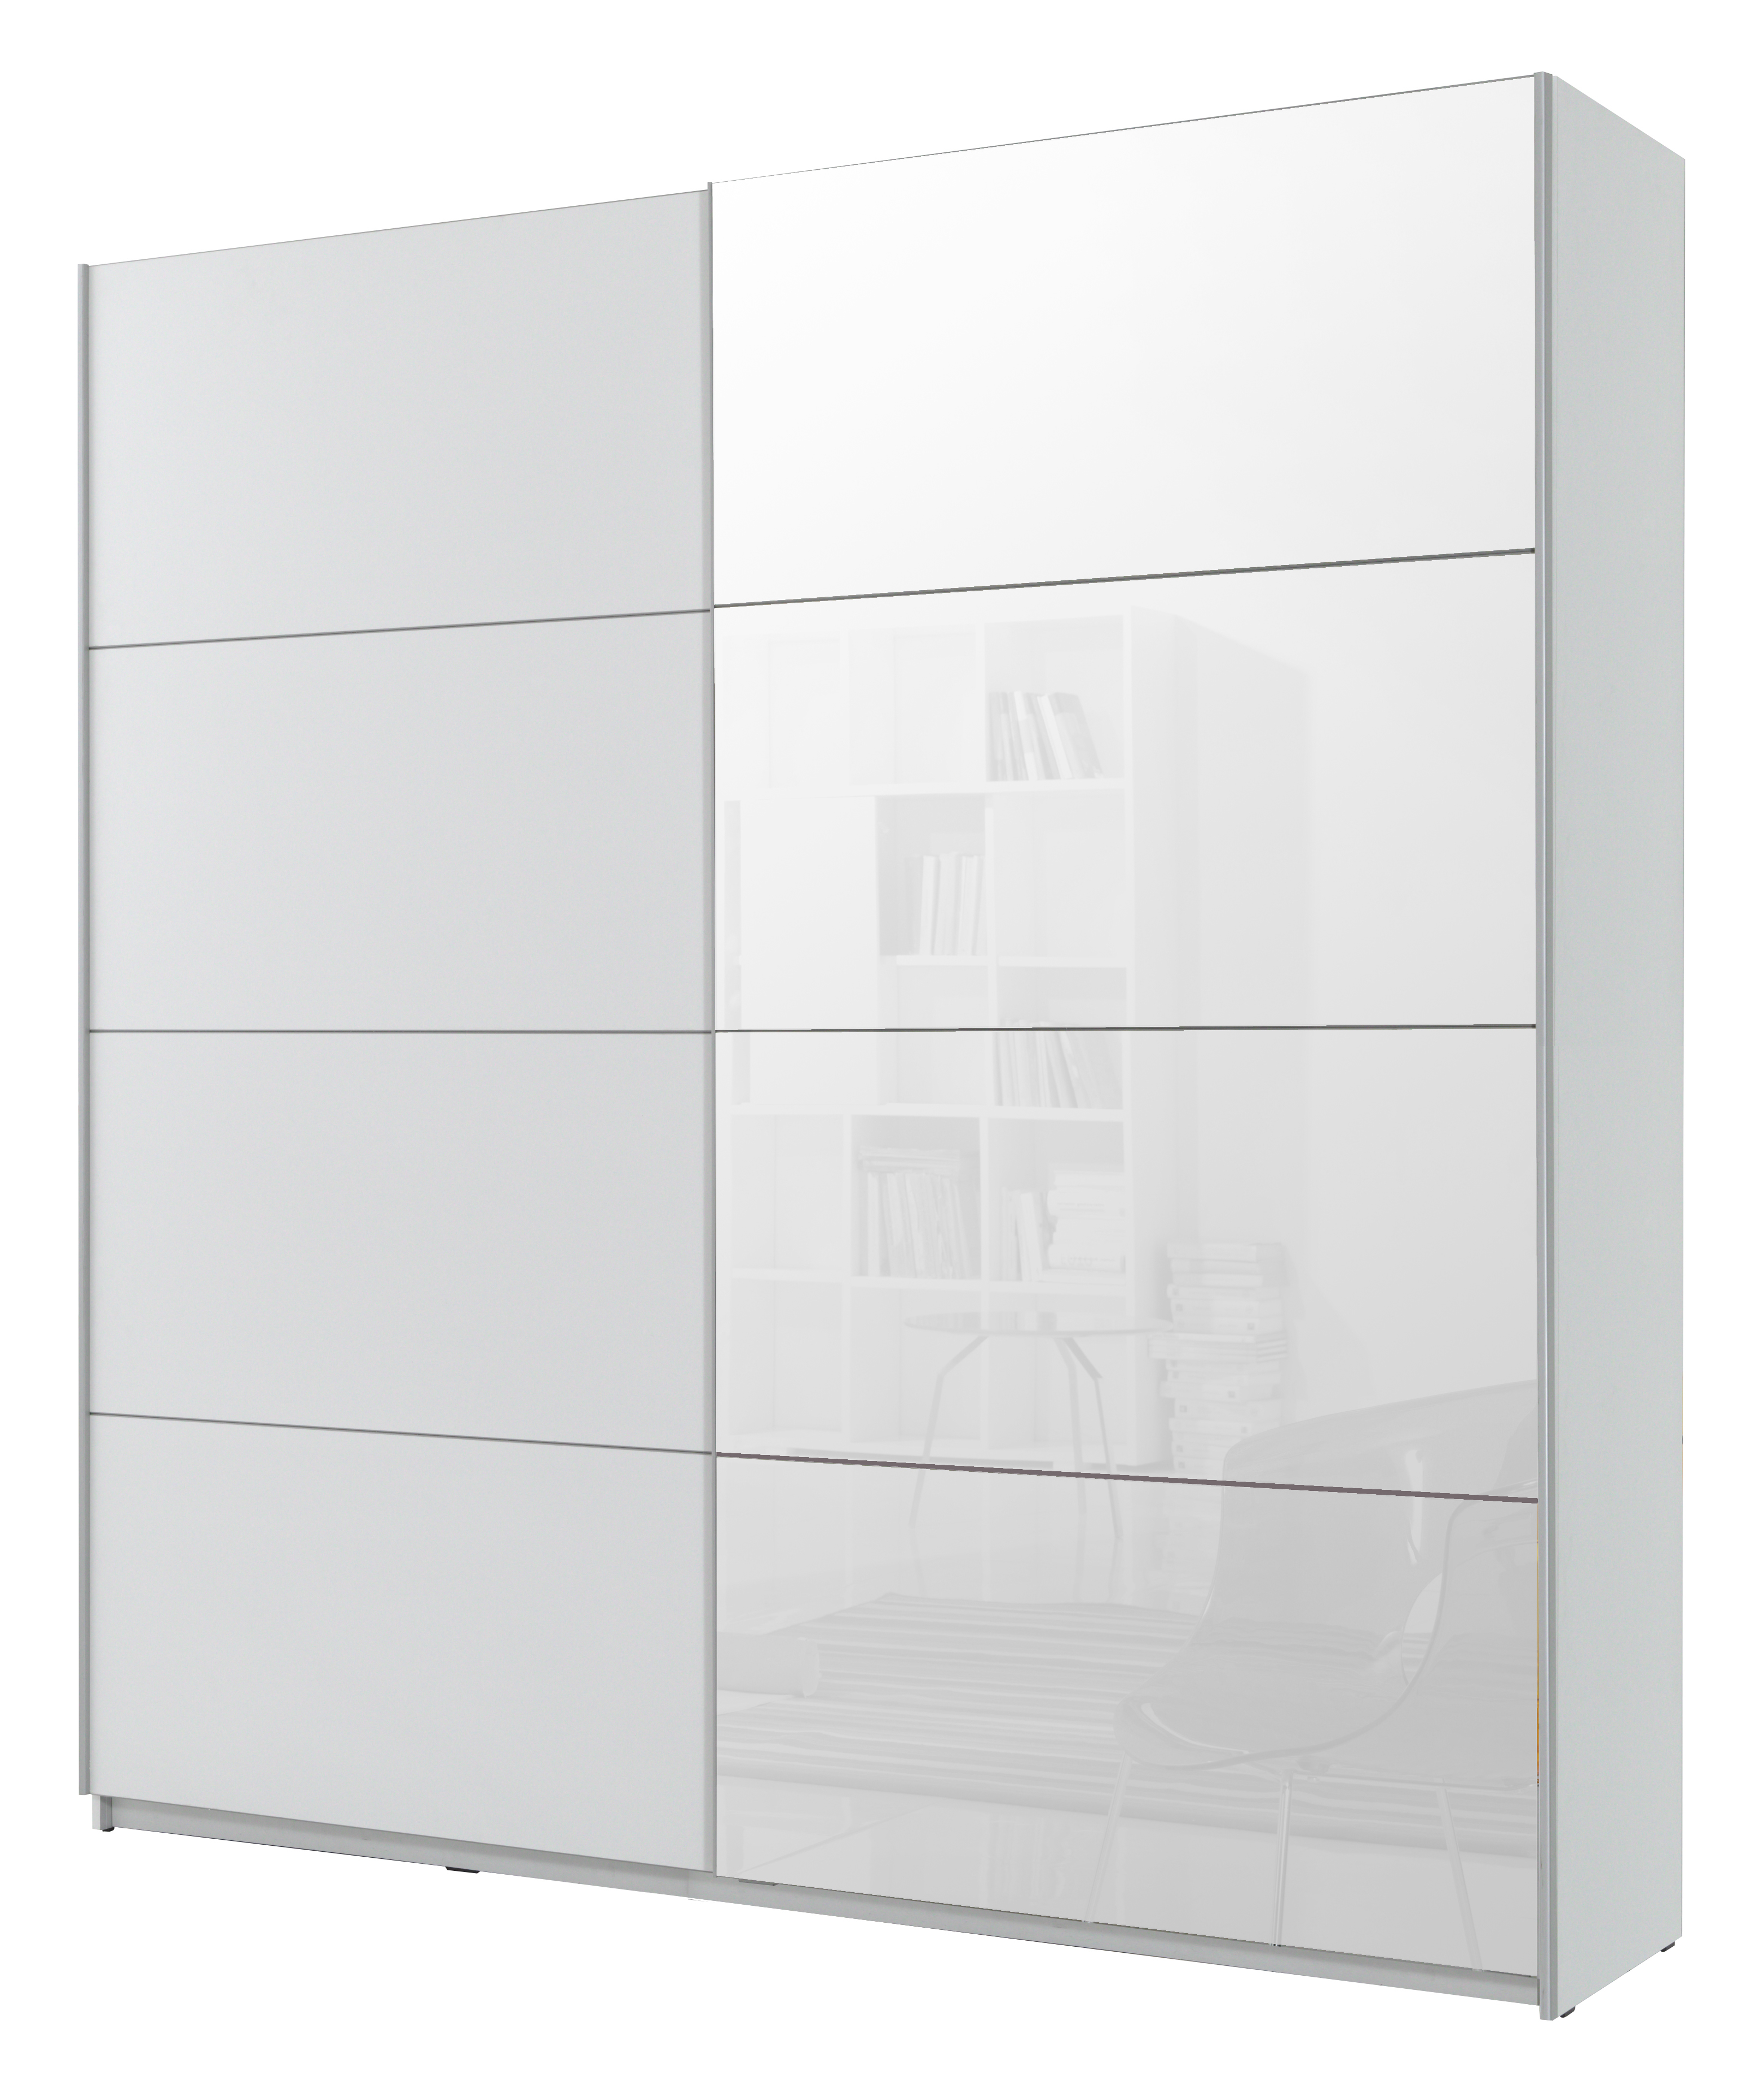 Šatní skříň - Benson - Typ 57 (bílá + zrcadlo)